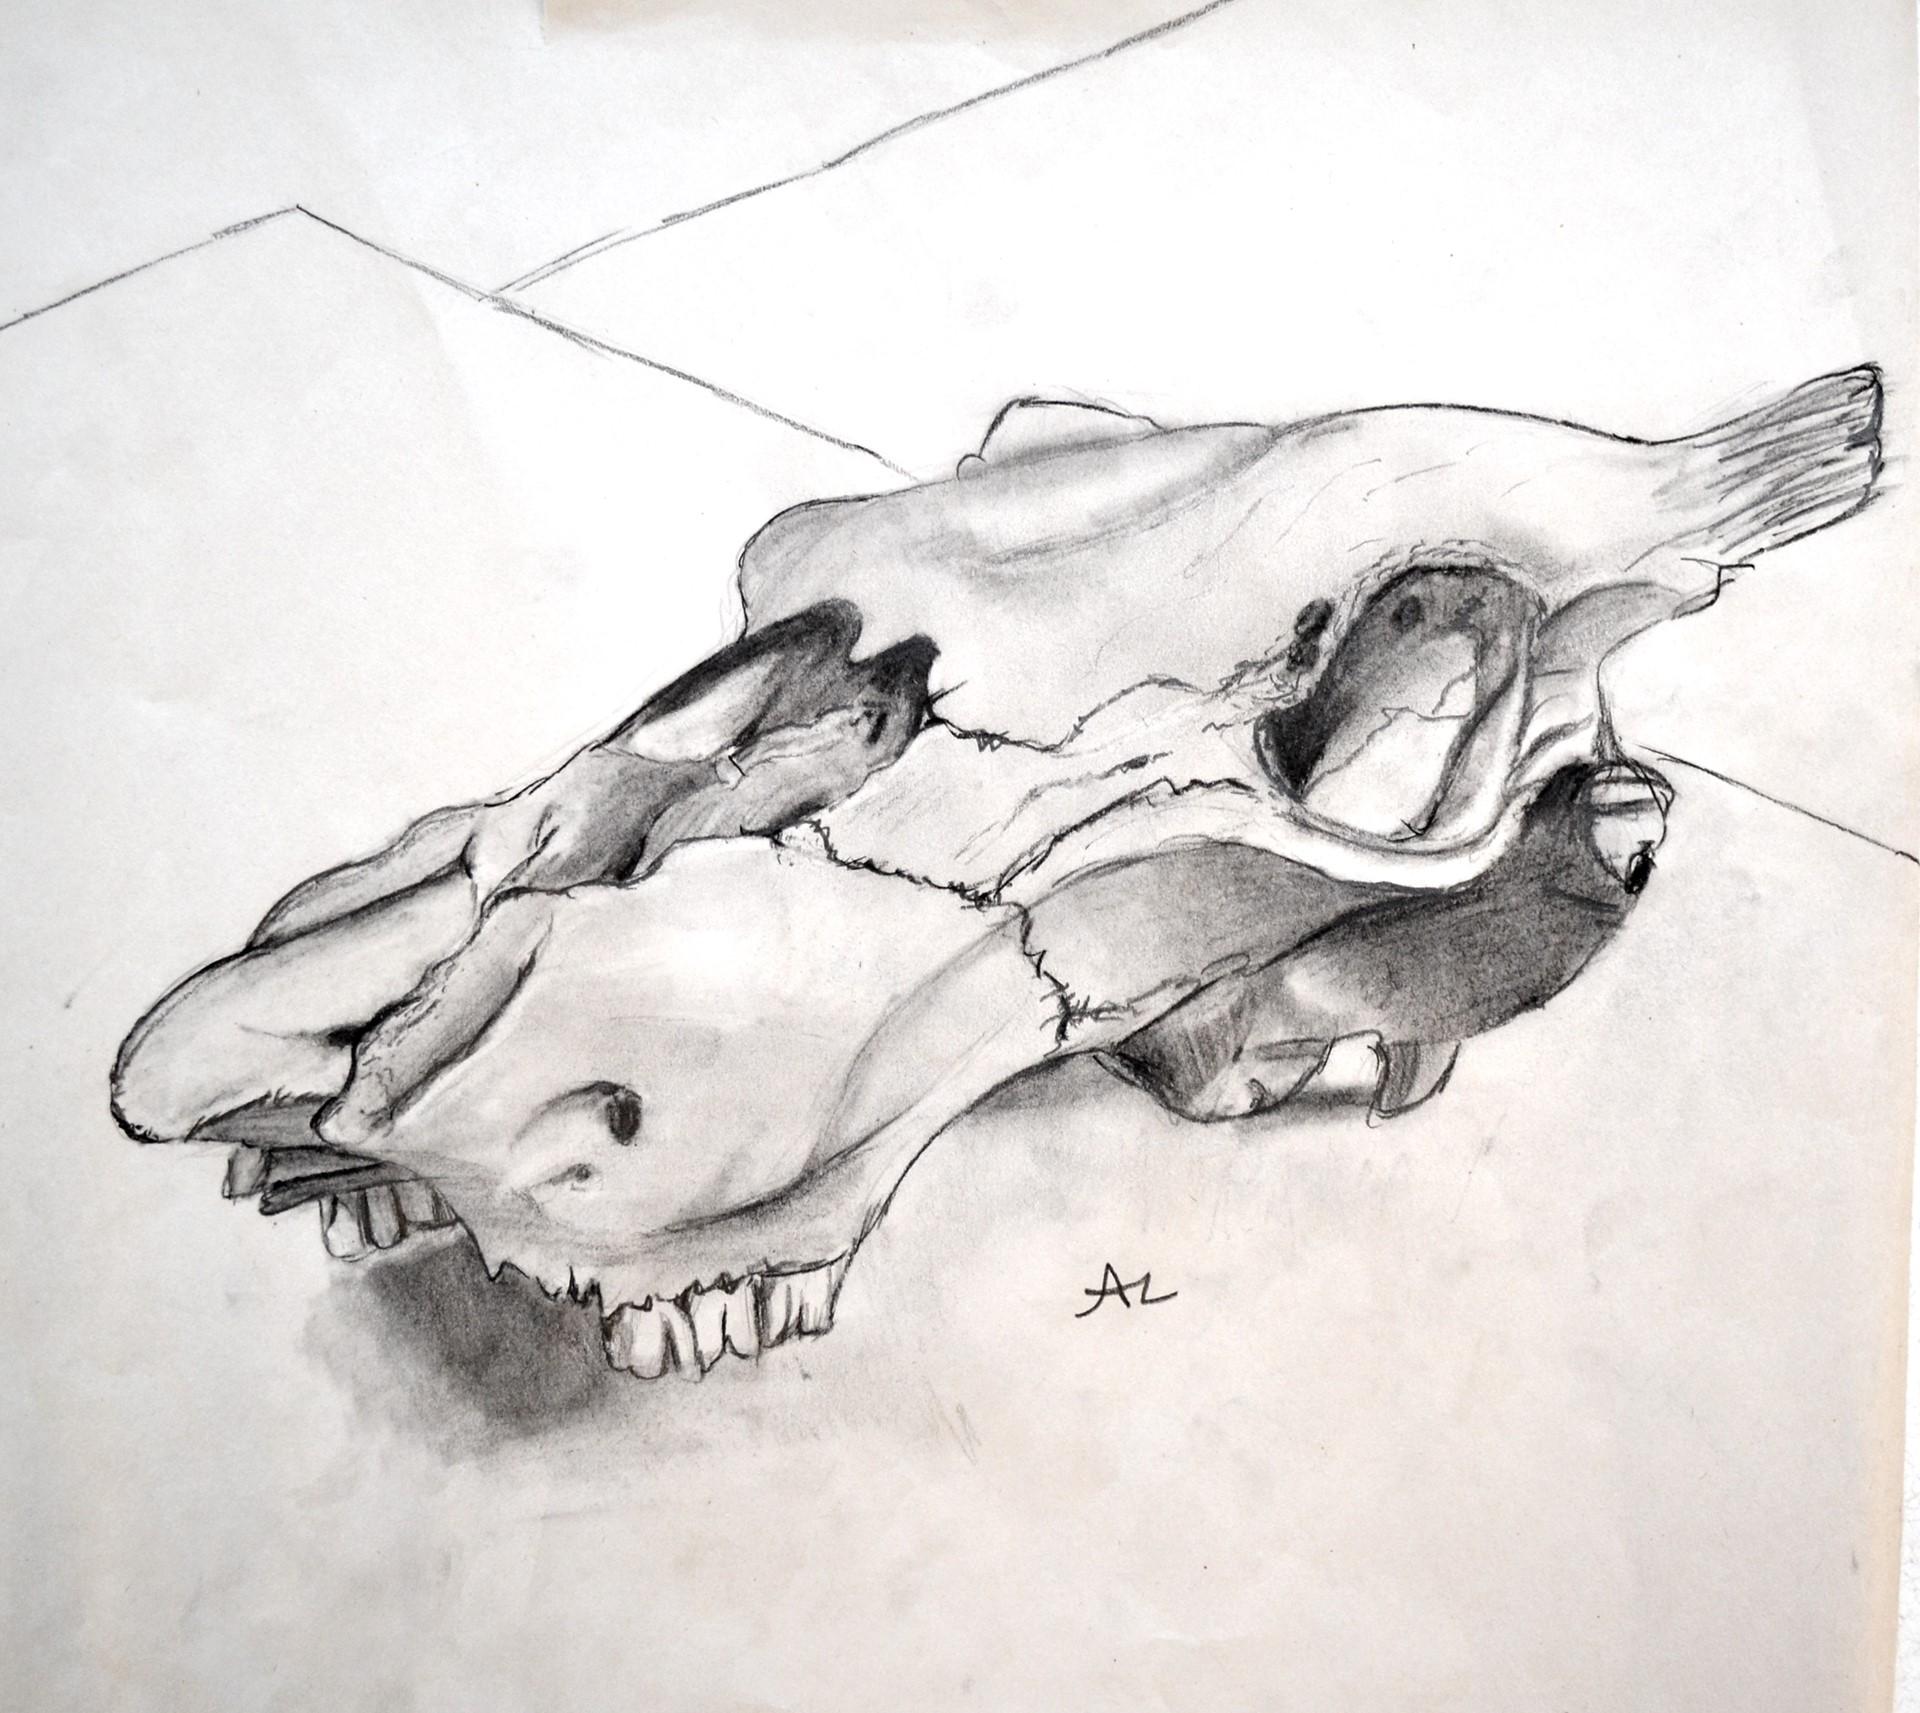 ANGELA LANANNA, Cow Skull, graphite, charcoal, 14 x 15, 2014